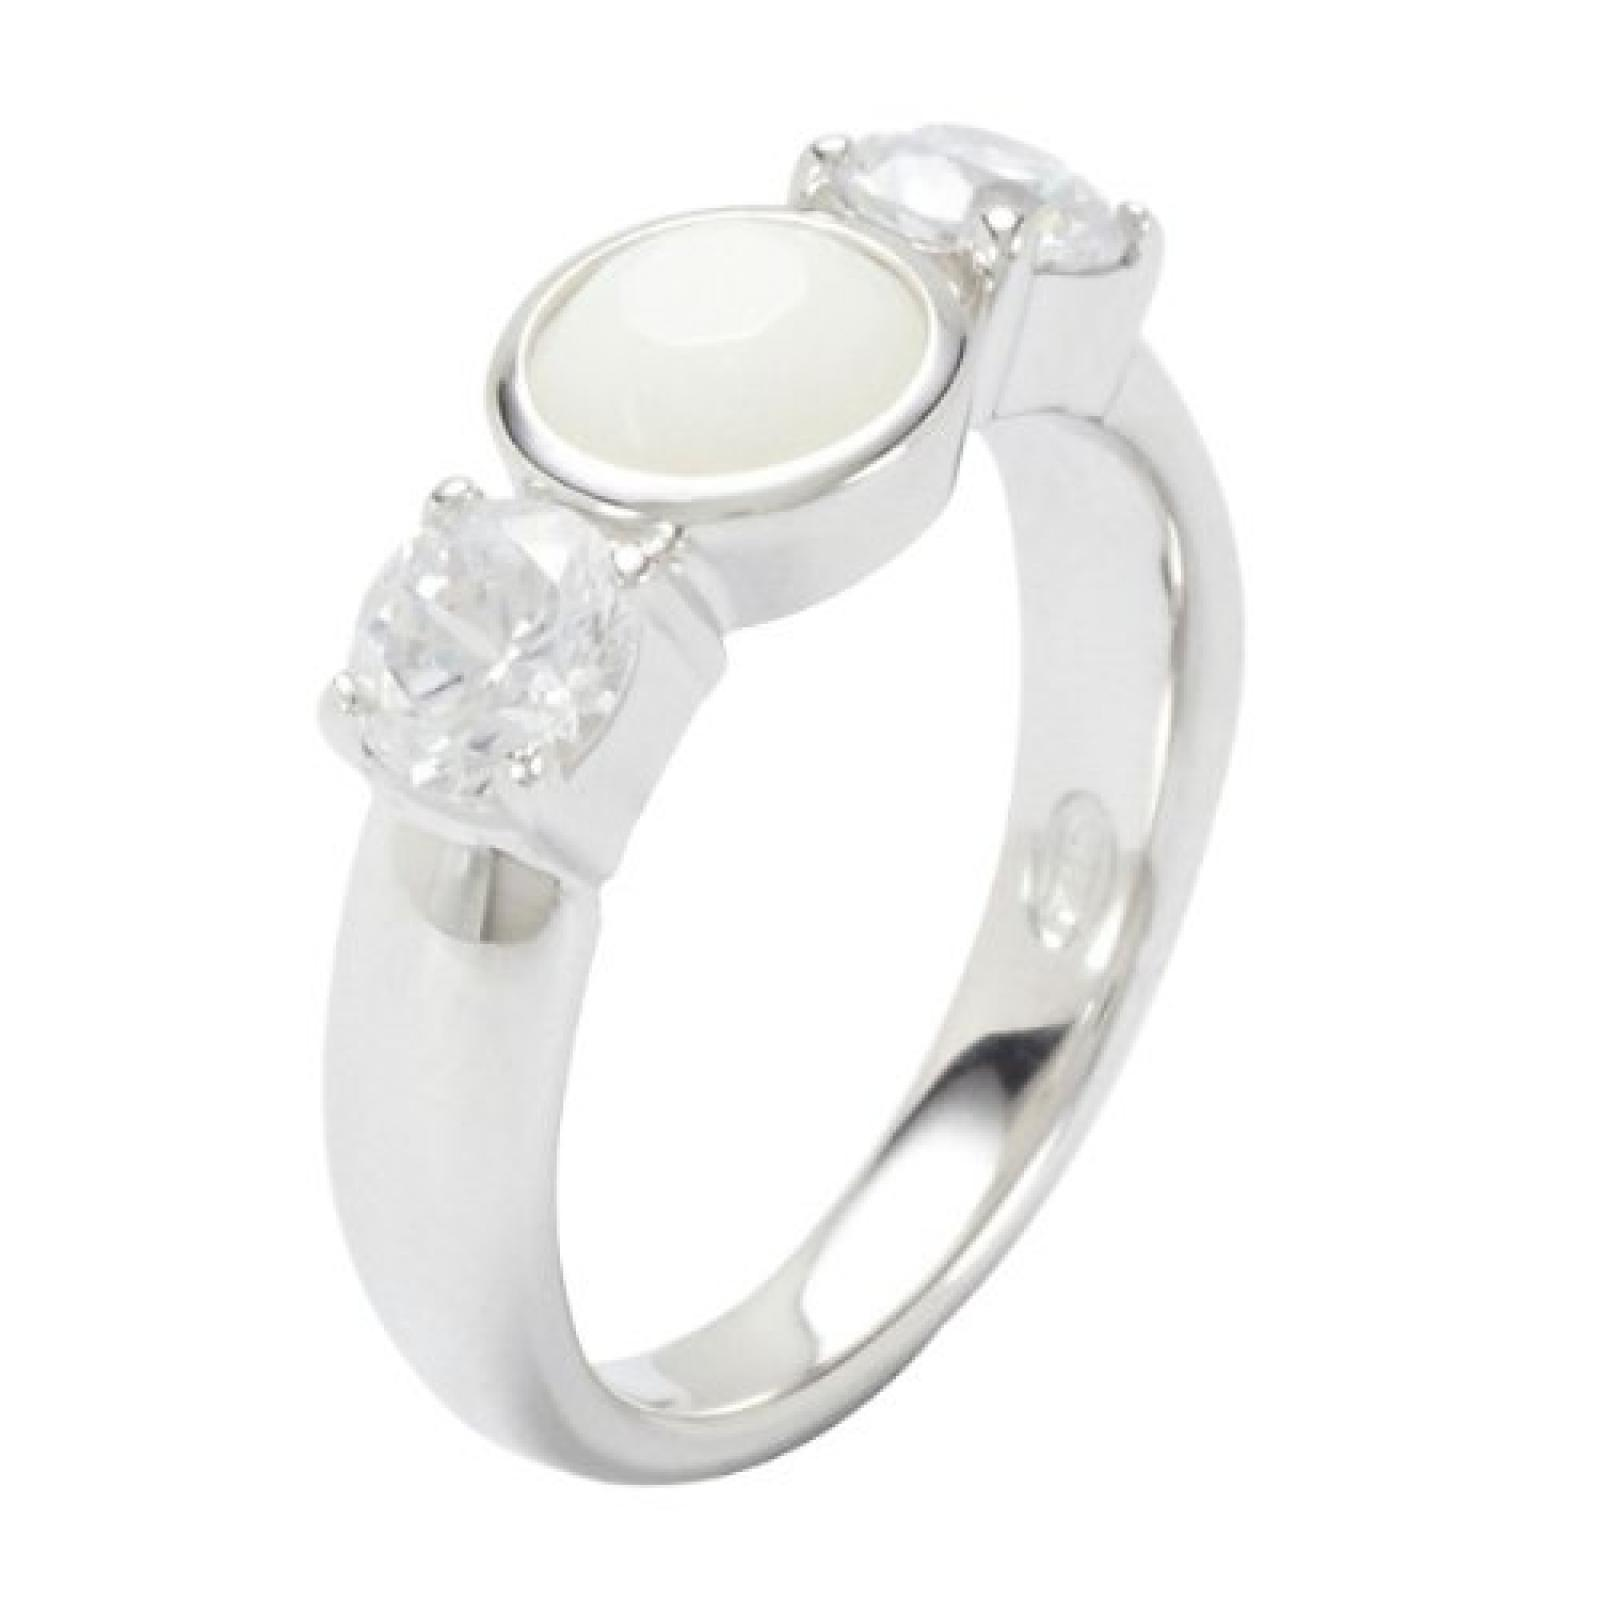 Fossil Damen-Ring 925 Sterling Silber Gr. 56 (17.8) JF18050040-8